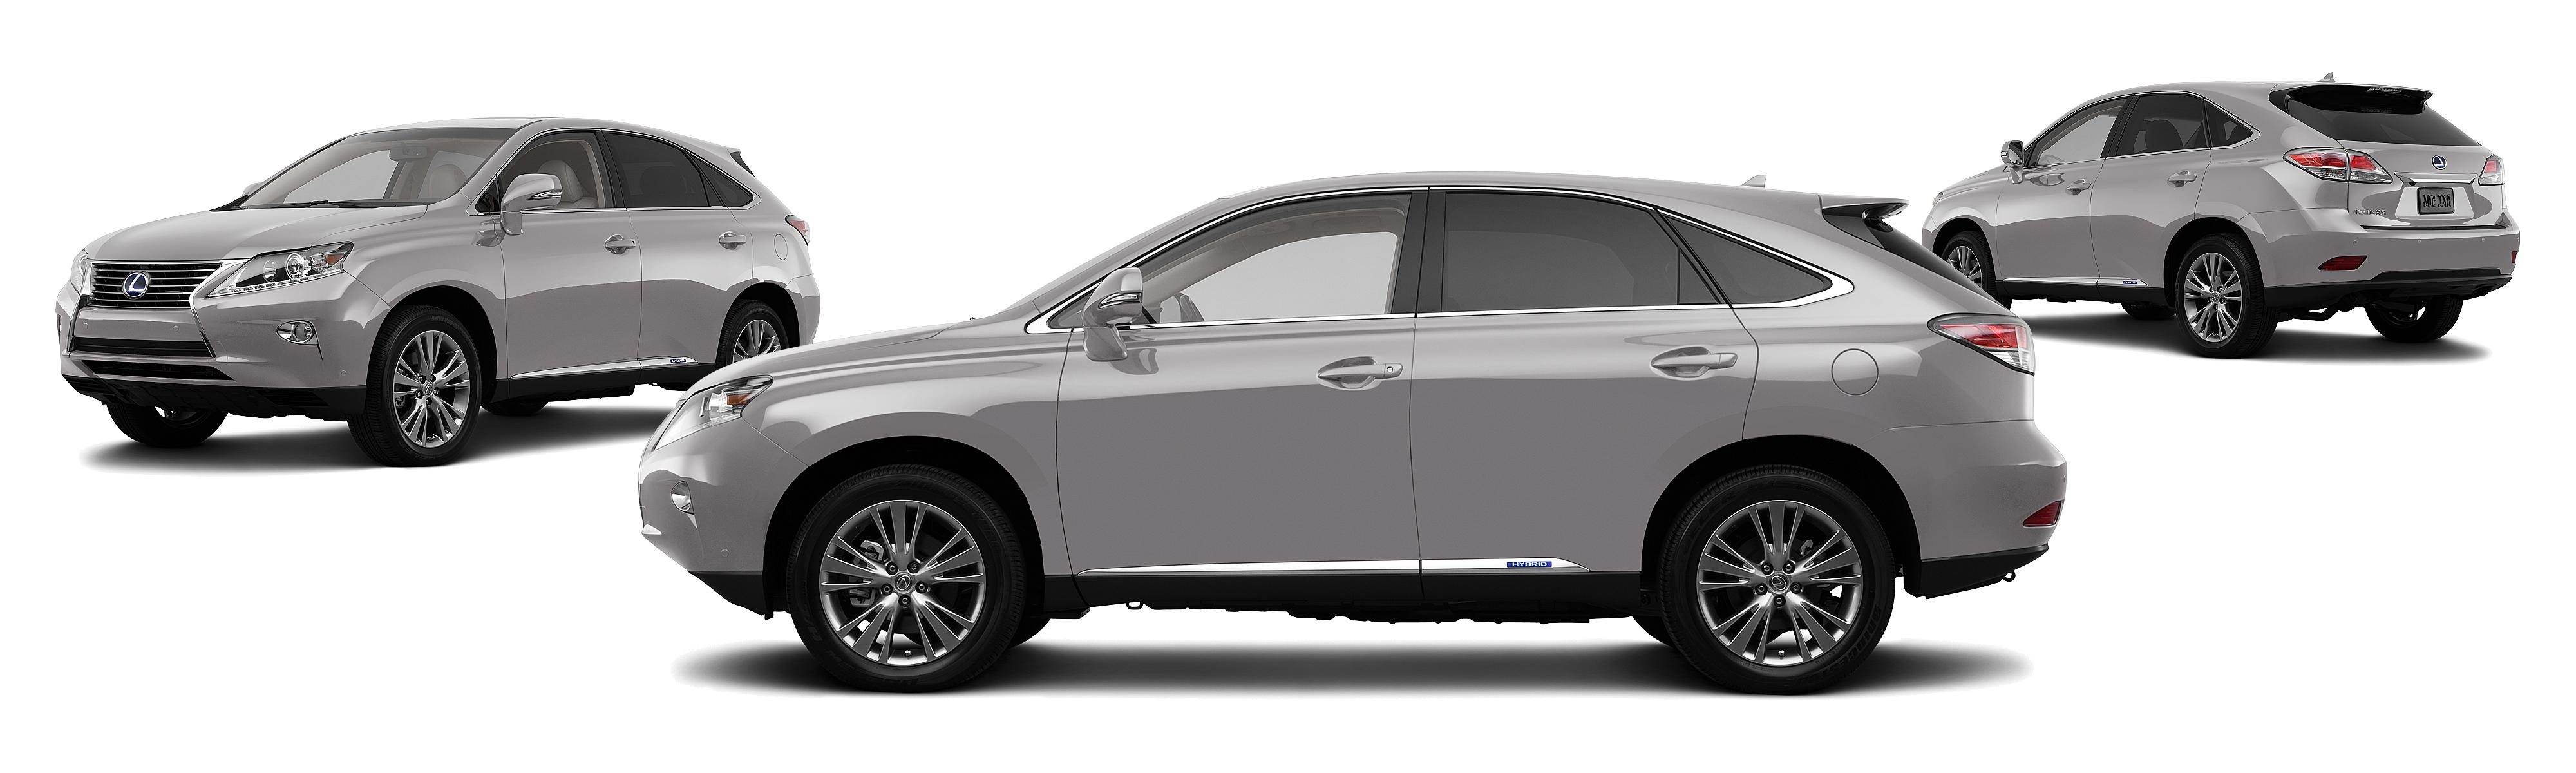 wallpapers cars ultra hd suv lexus pin vx